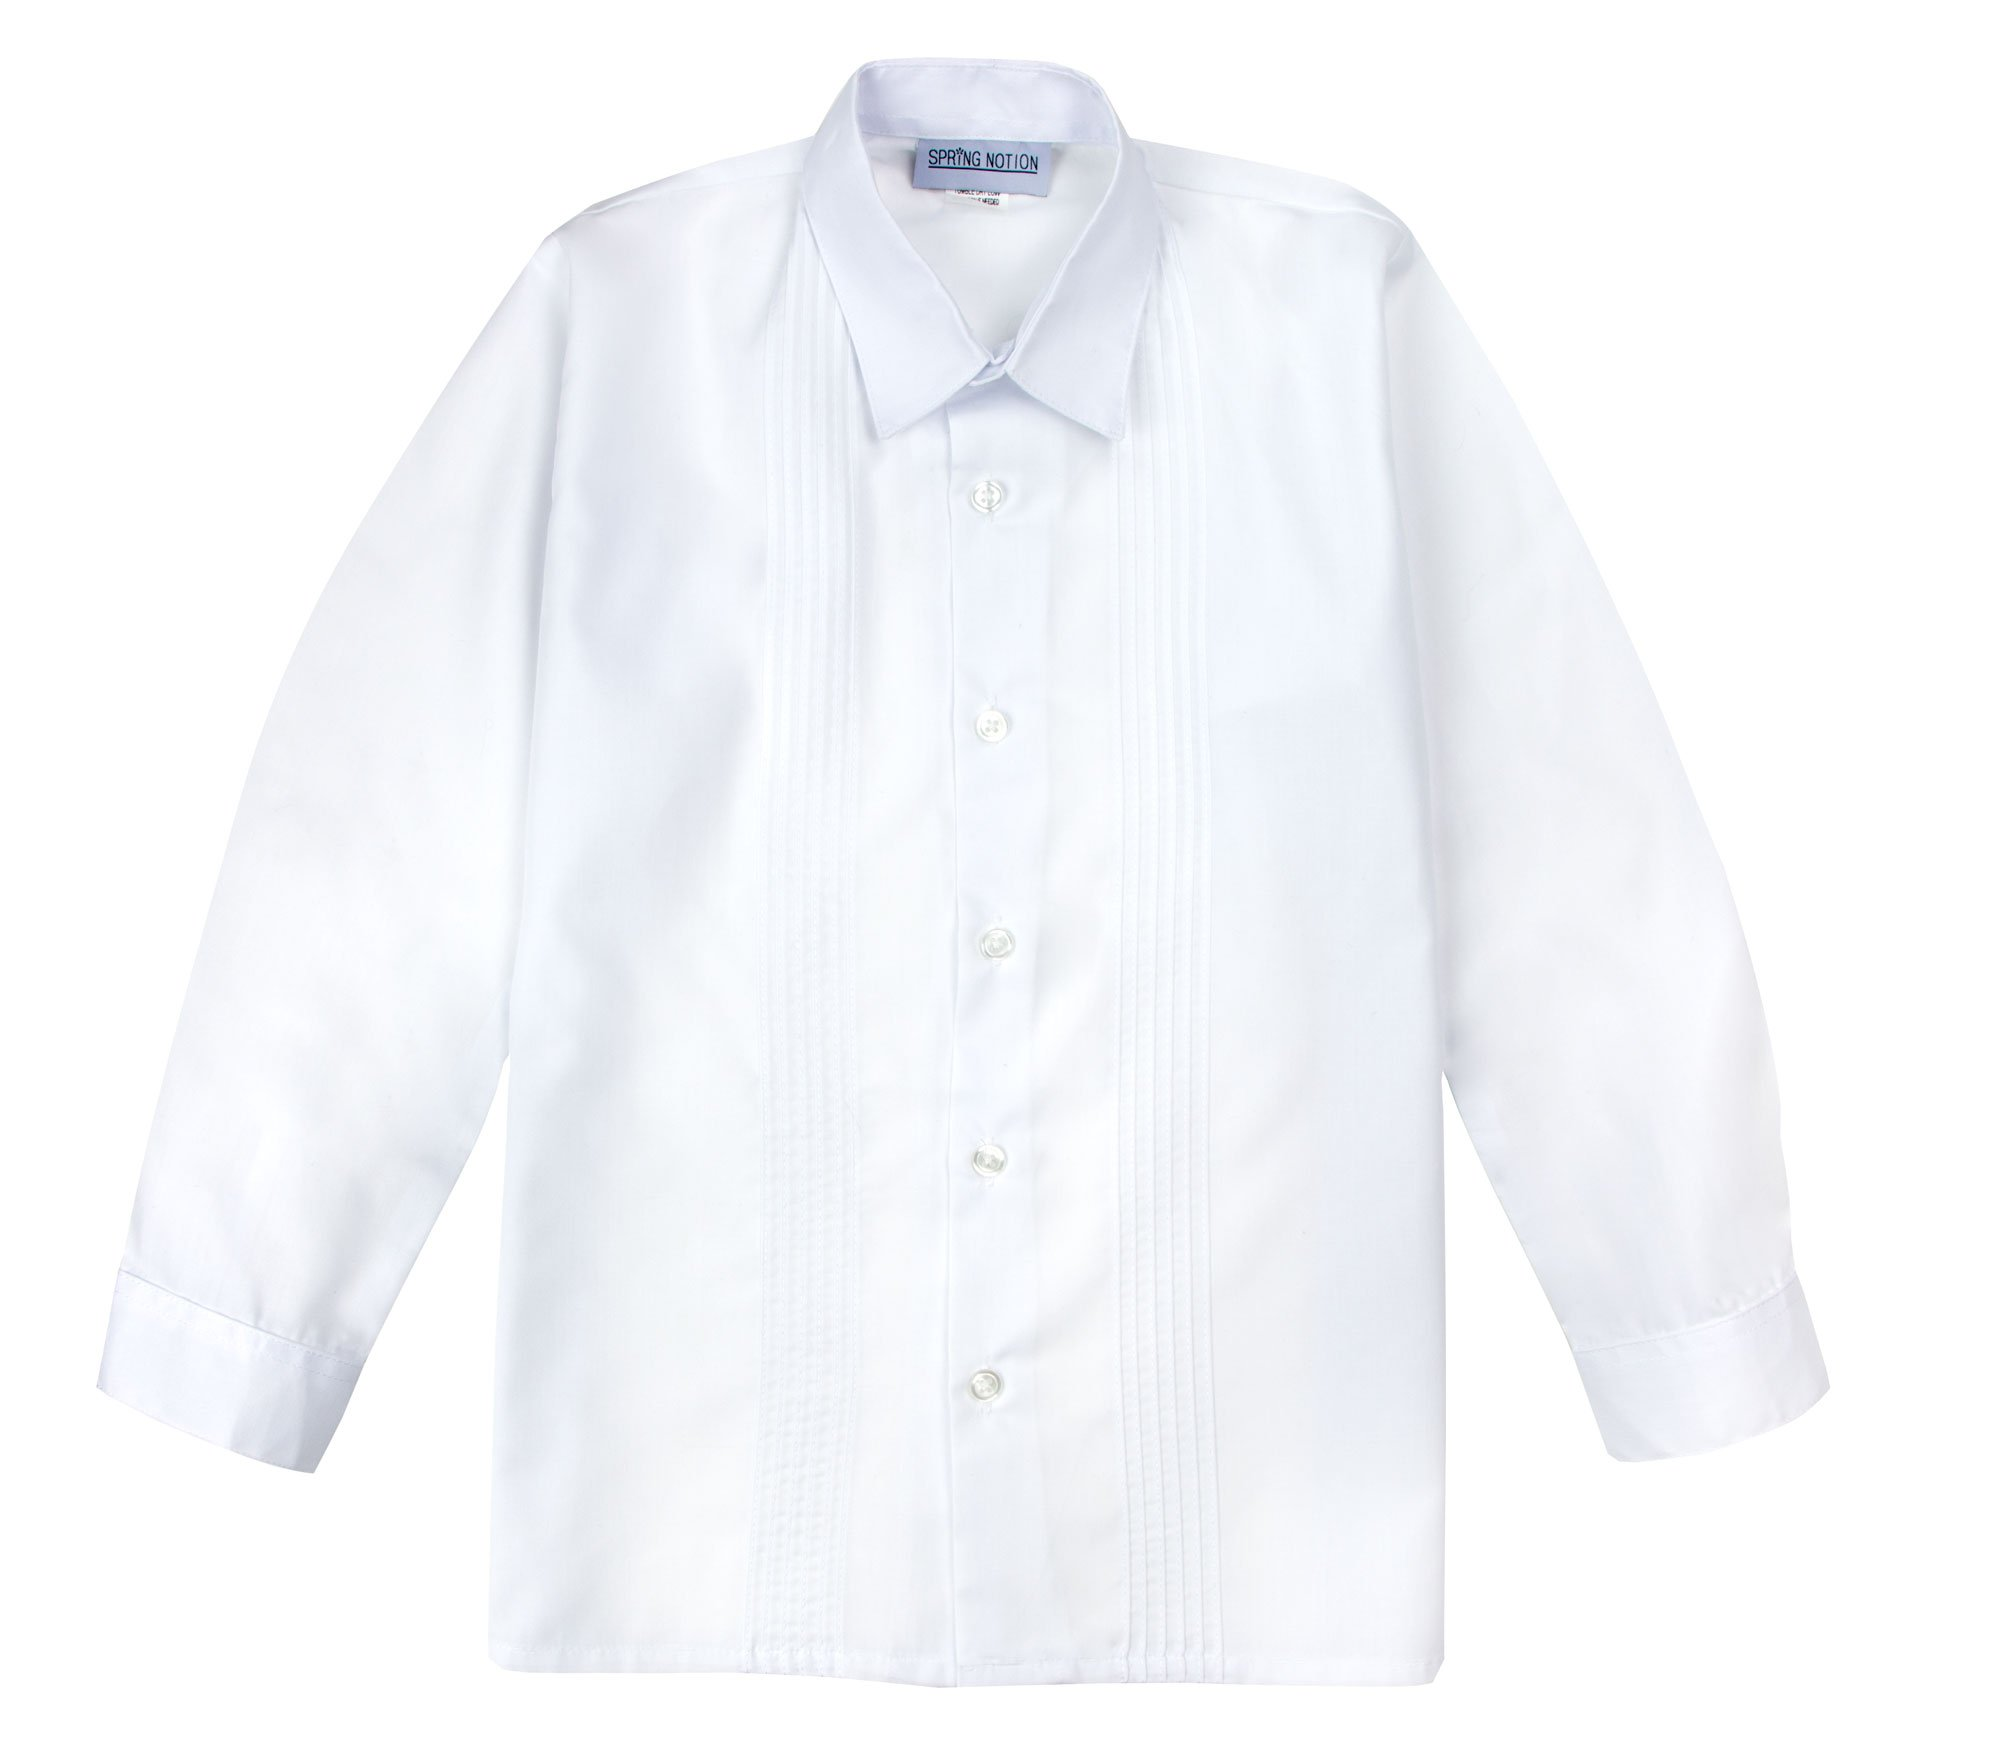 Spring Notion Boys' Tuxedo Suspender Set 08 Style 06 by Spring Notion (Image #3)